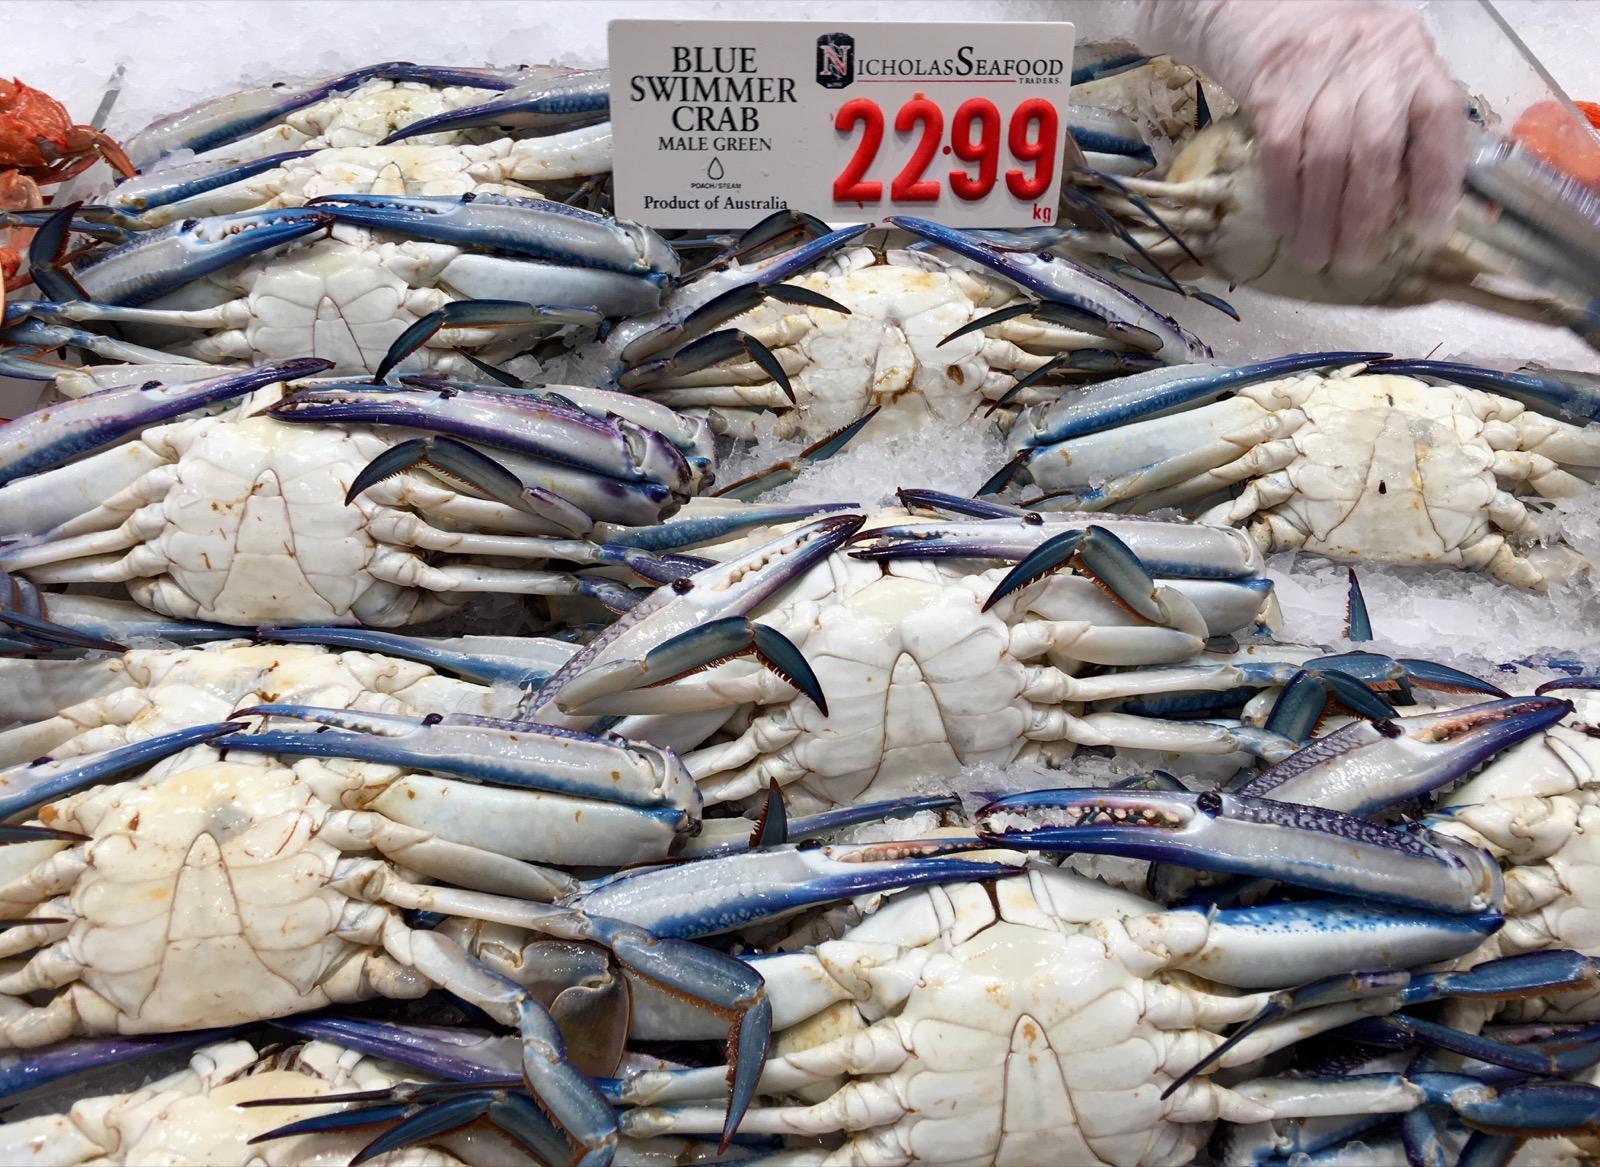 sydney-fish-market_blue-swimmer-crab